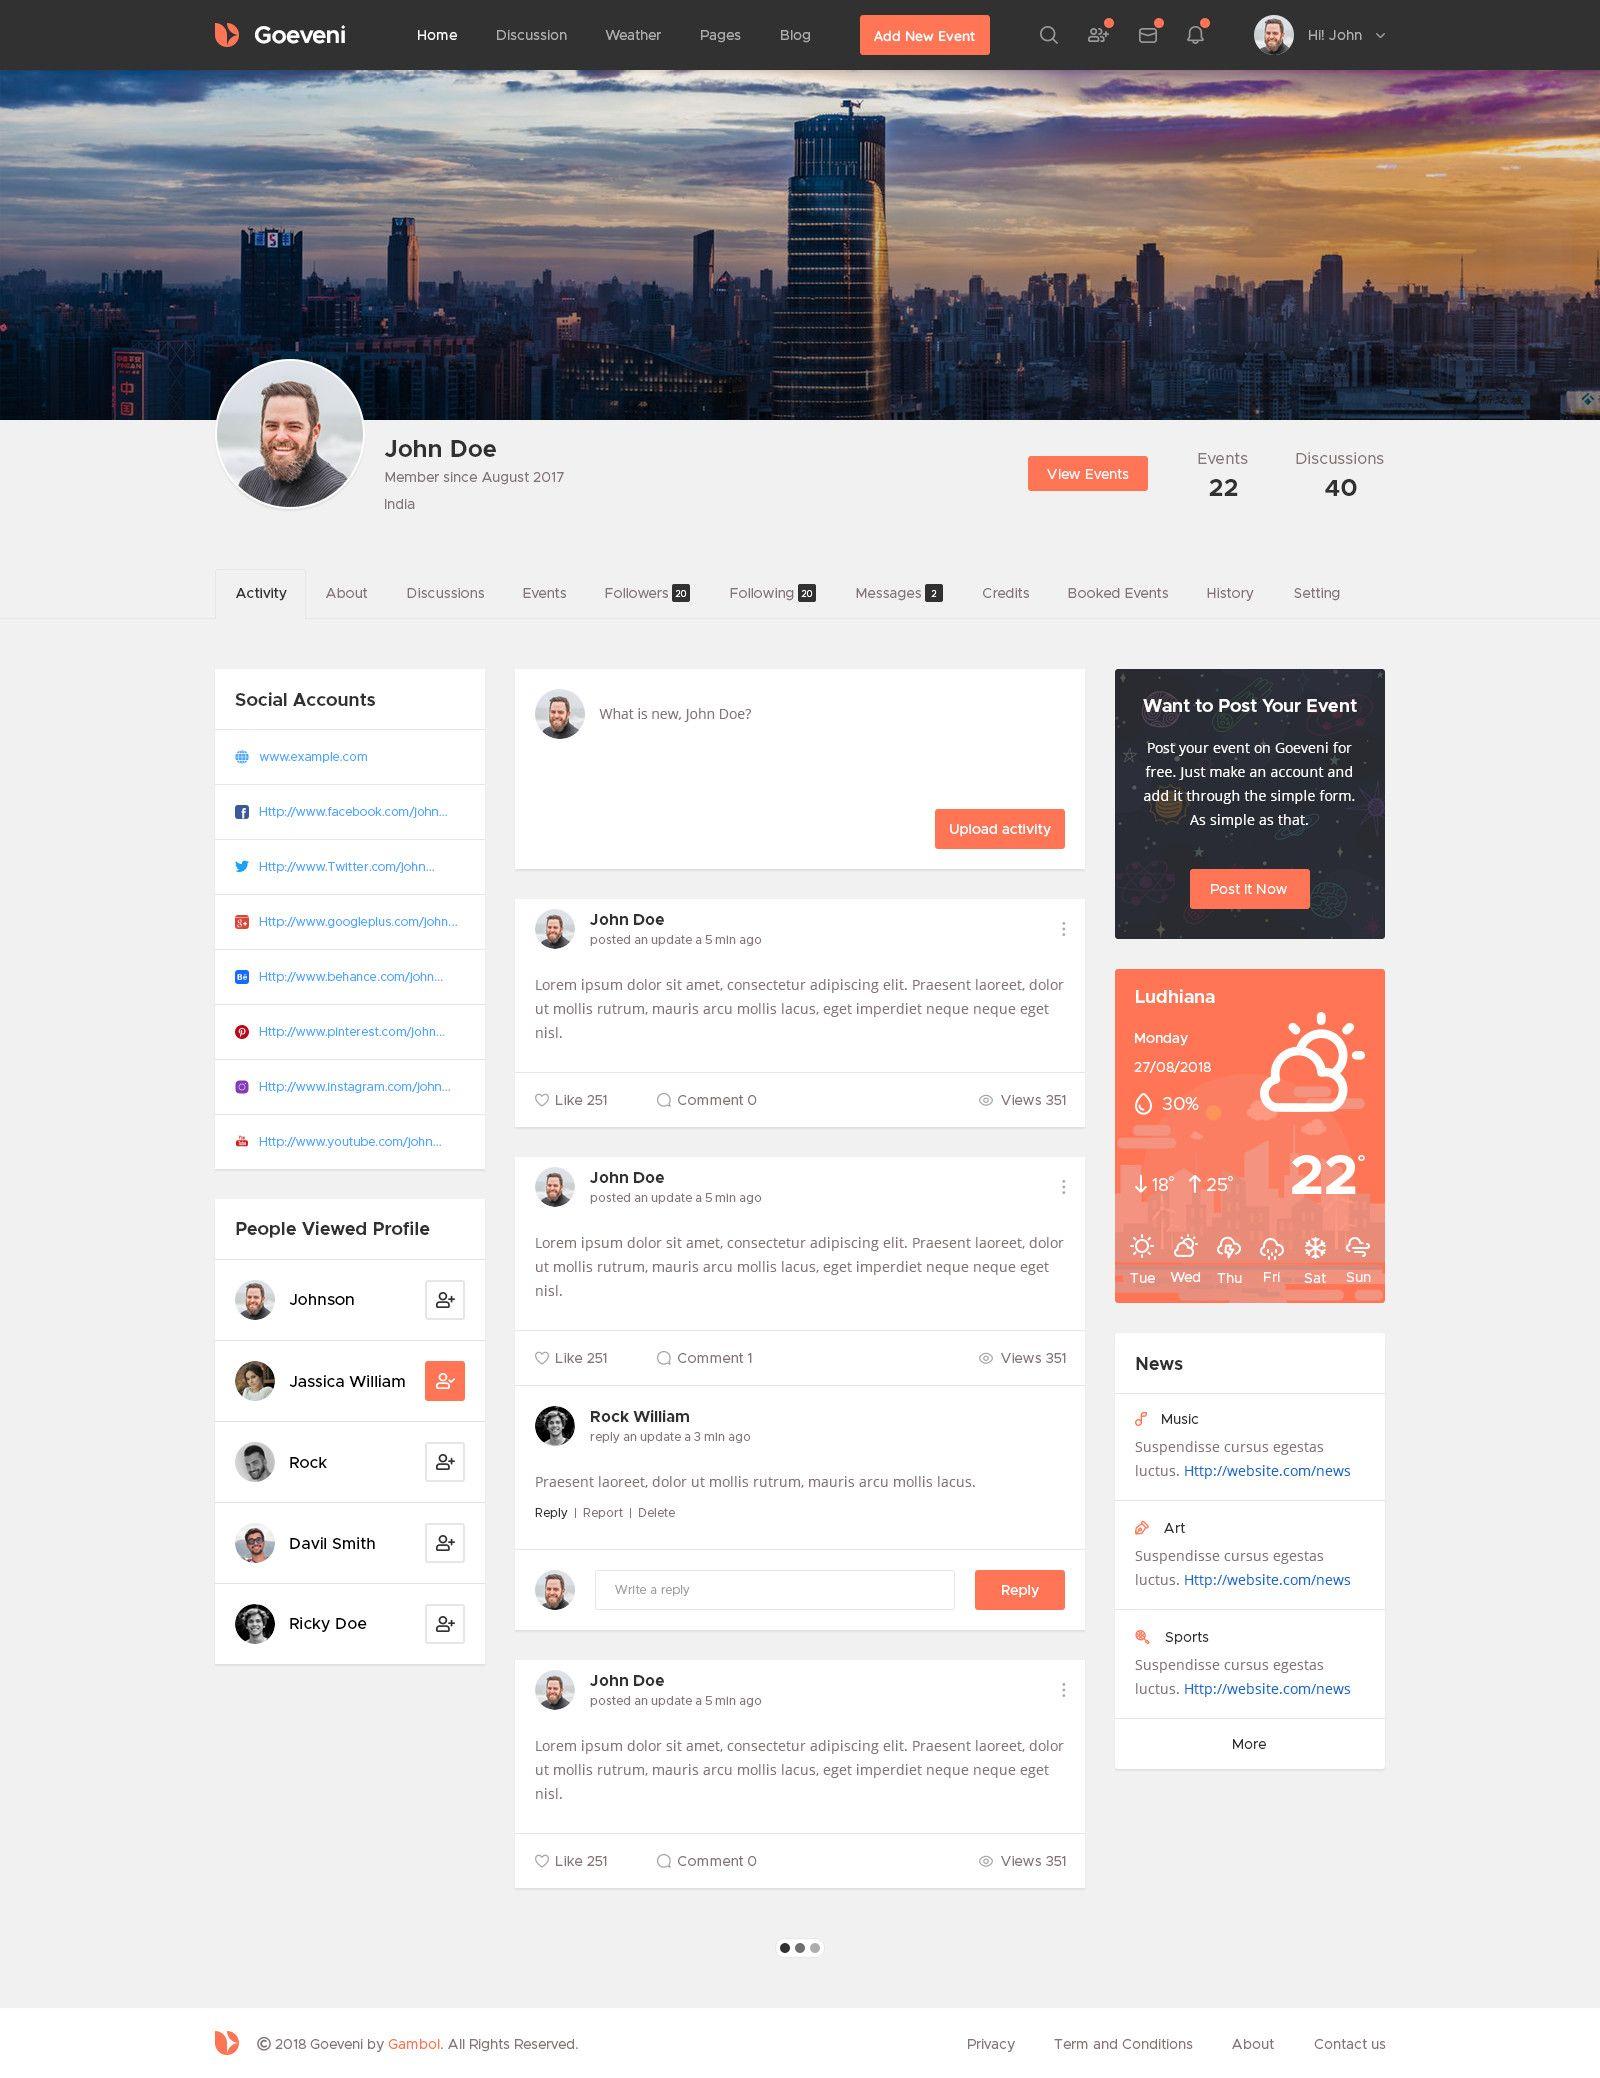 Goeveni Event Sharing Social Network Psd Template Clean Web Design Inspiration Psd Templates App Development Design